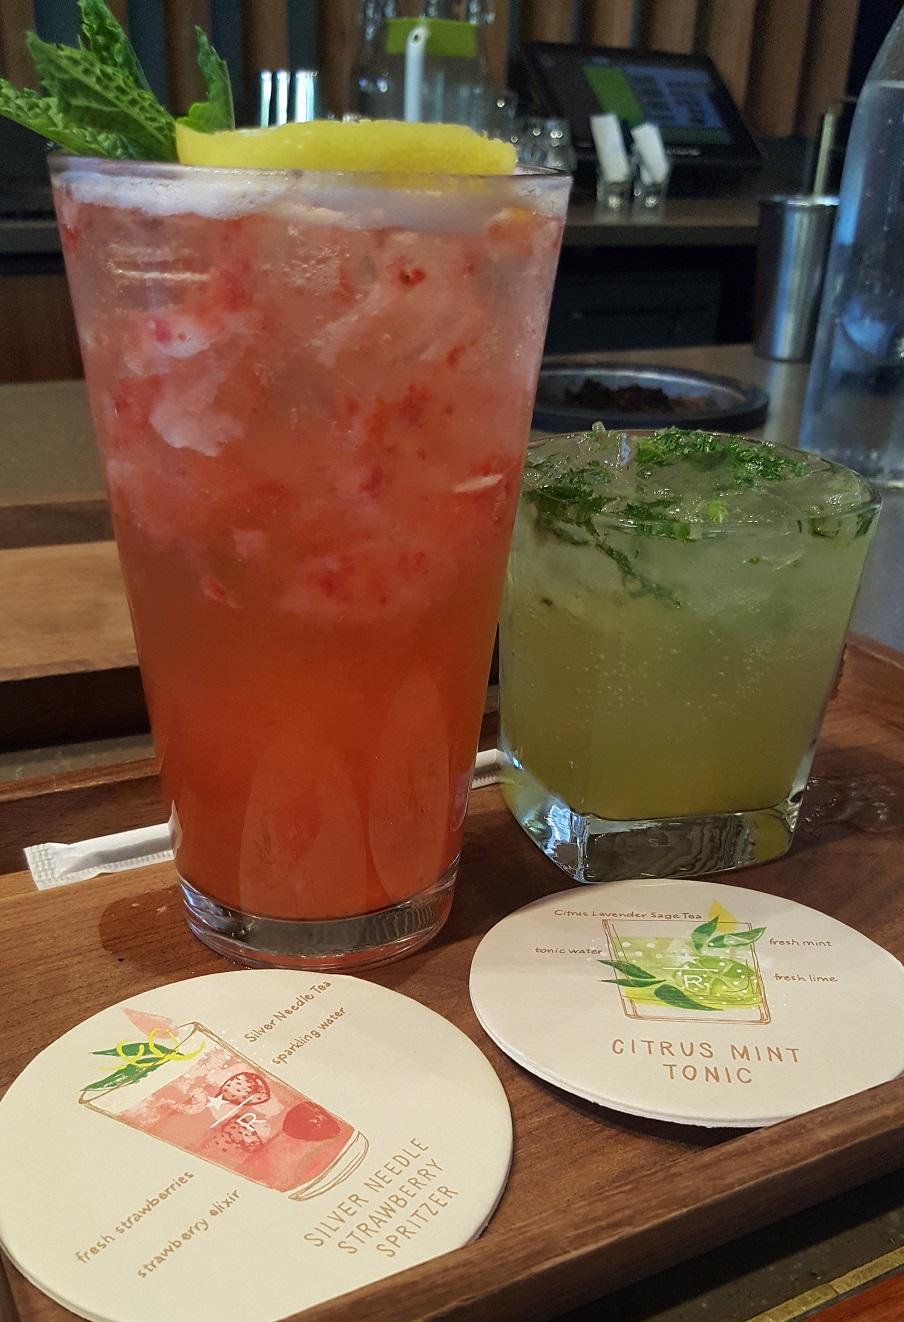 20170526_193027 Both new drinks.jpg